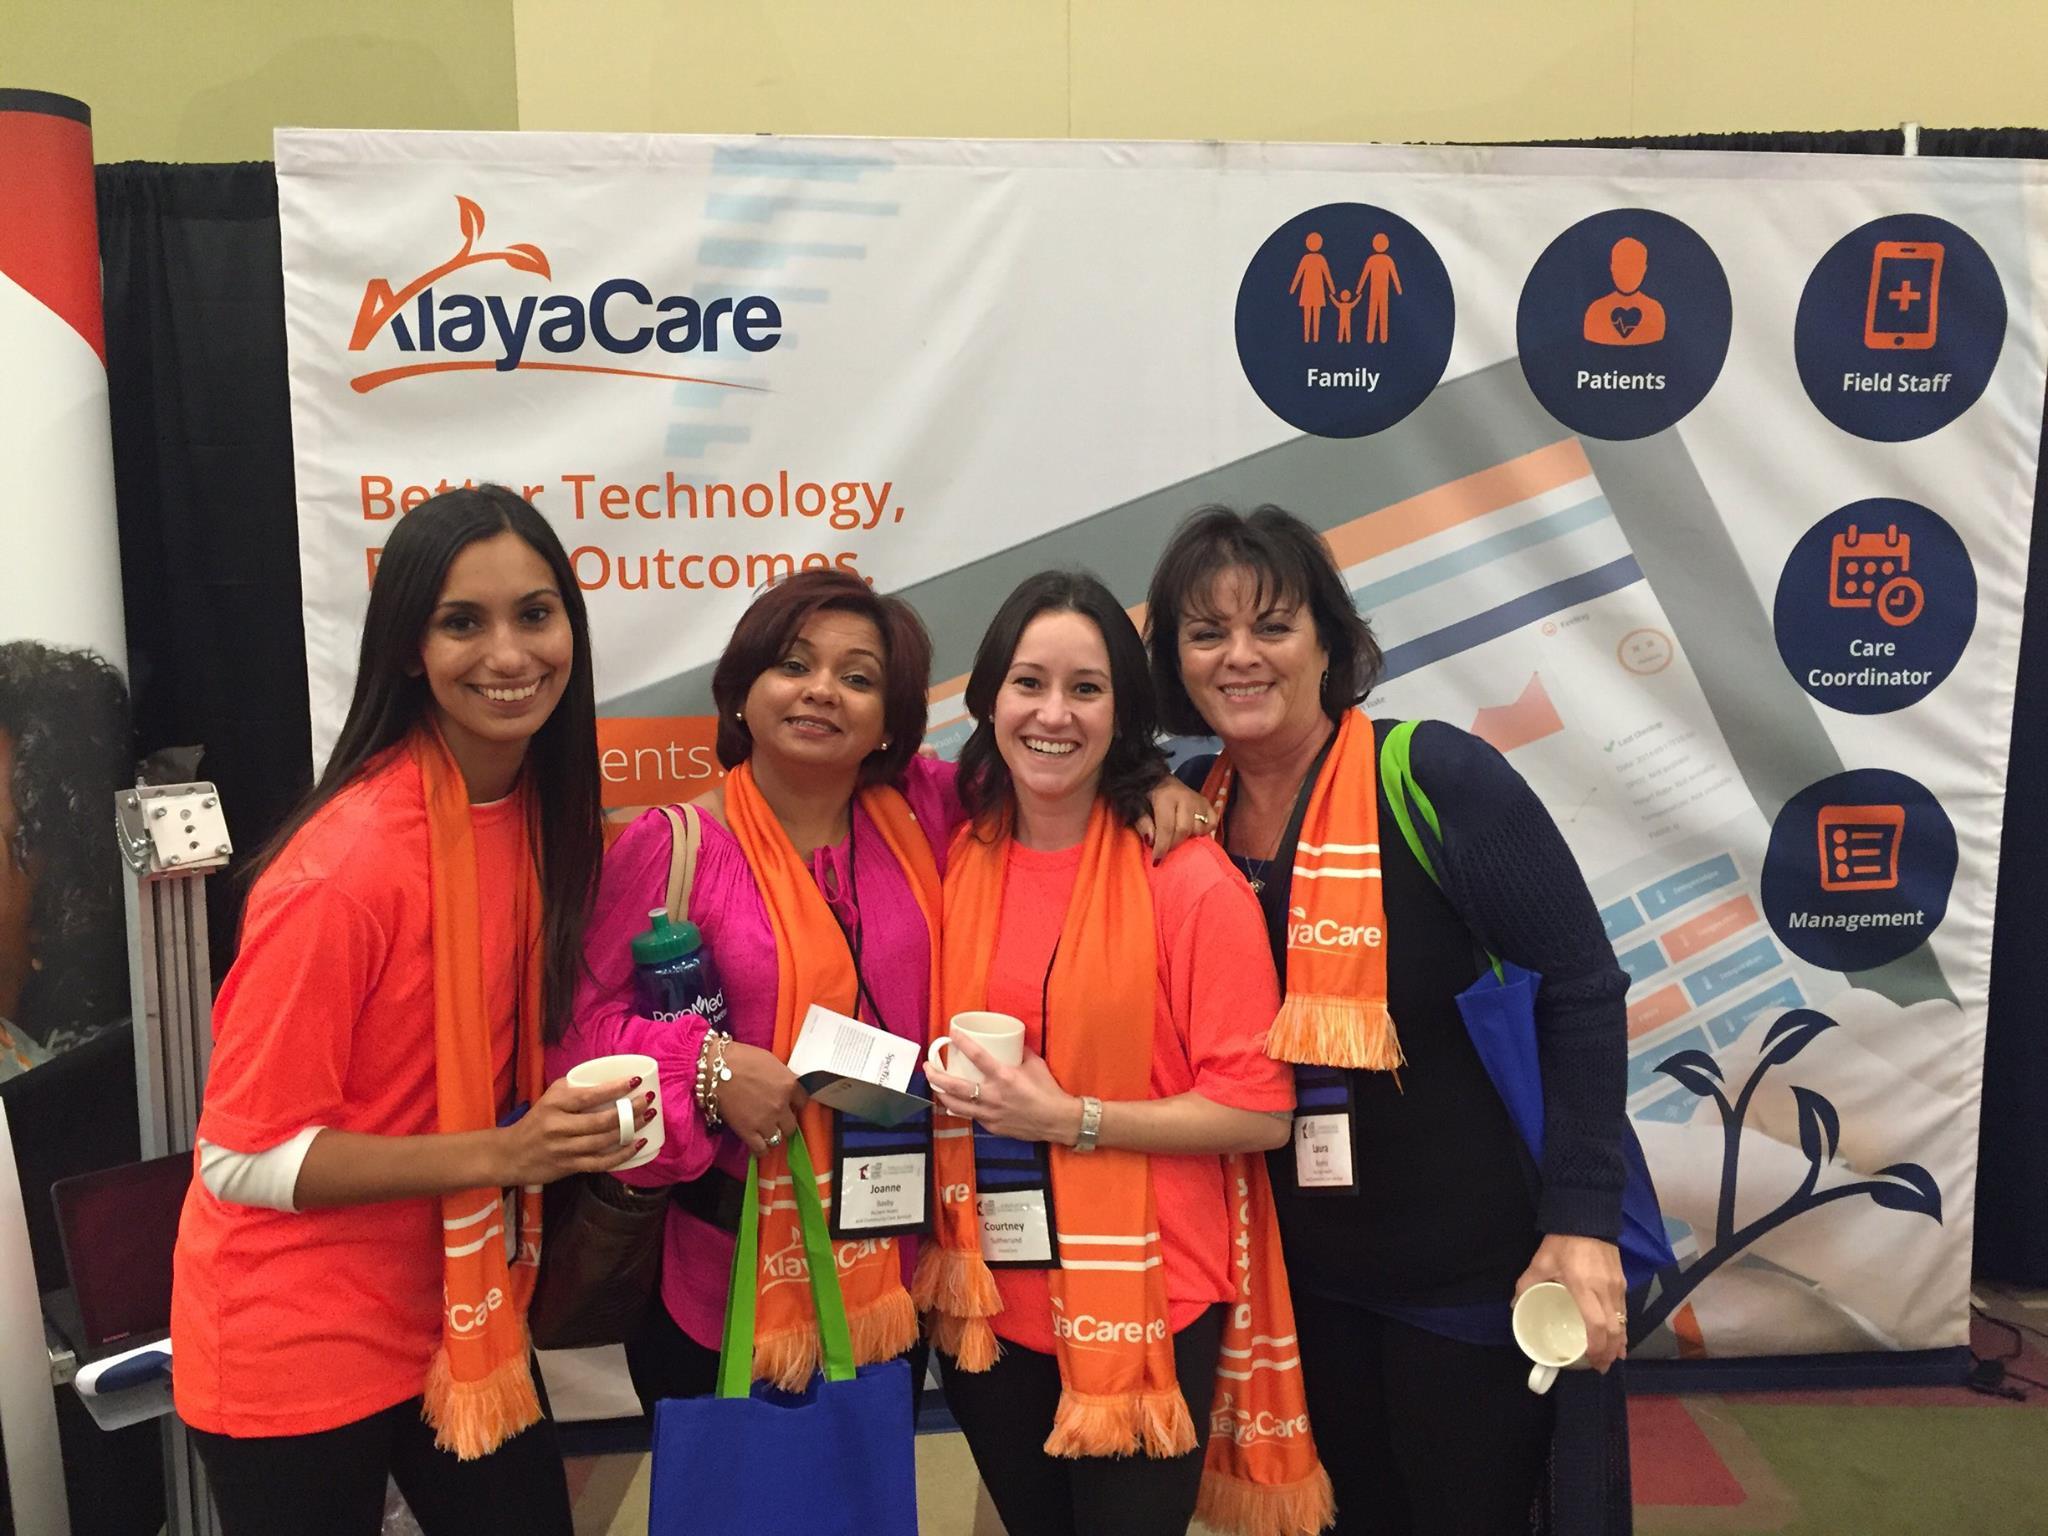 AlayaCare - 2015 Home Care Summit